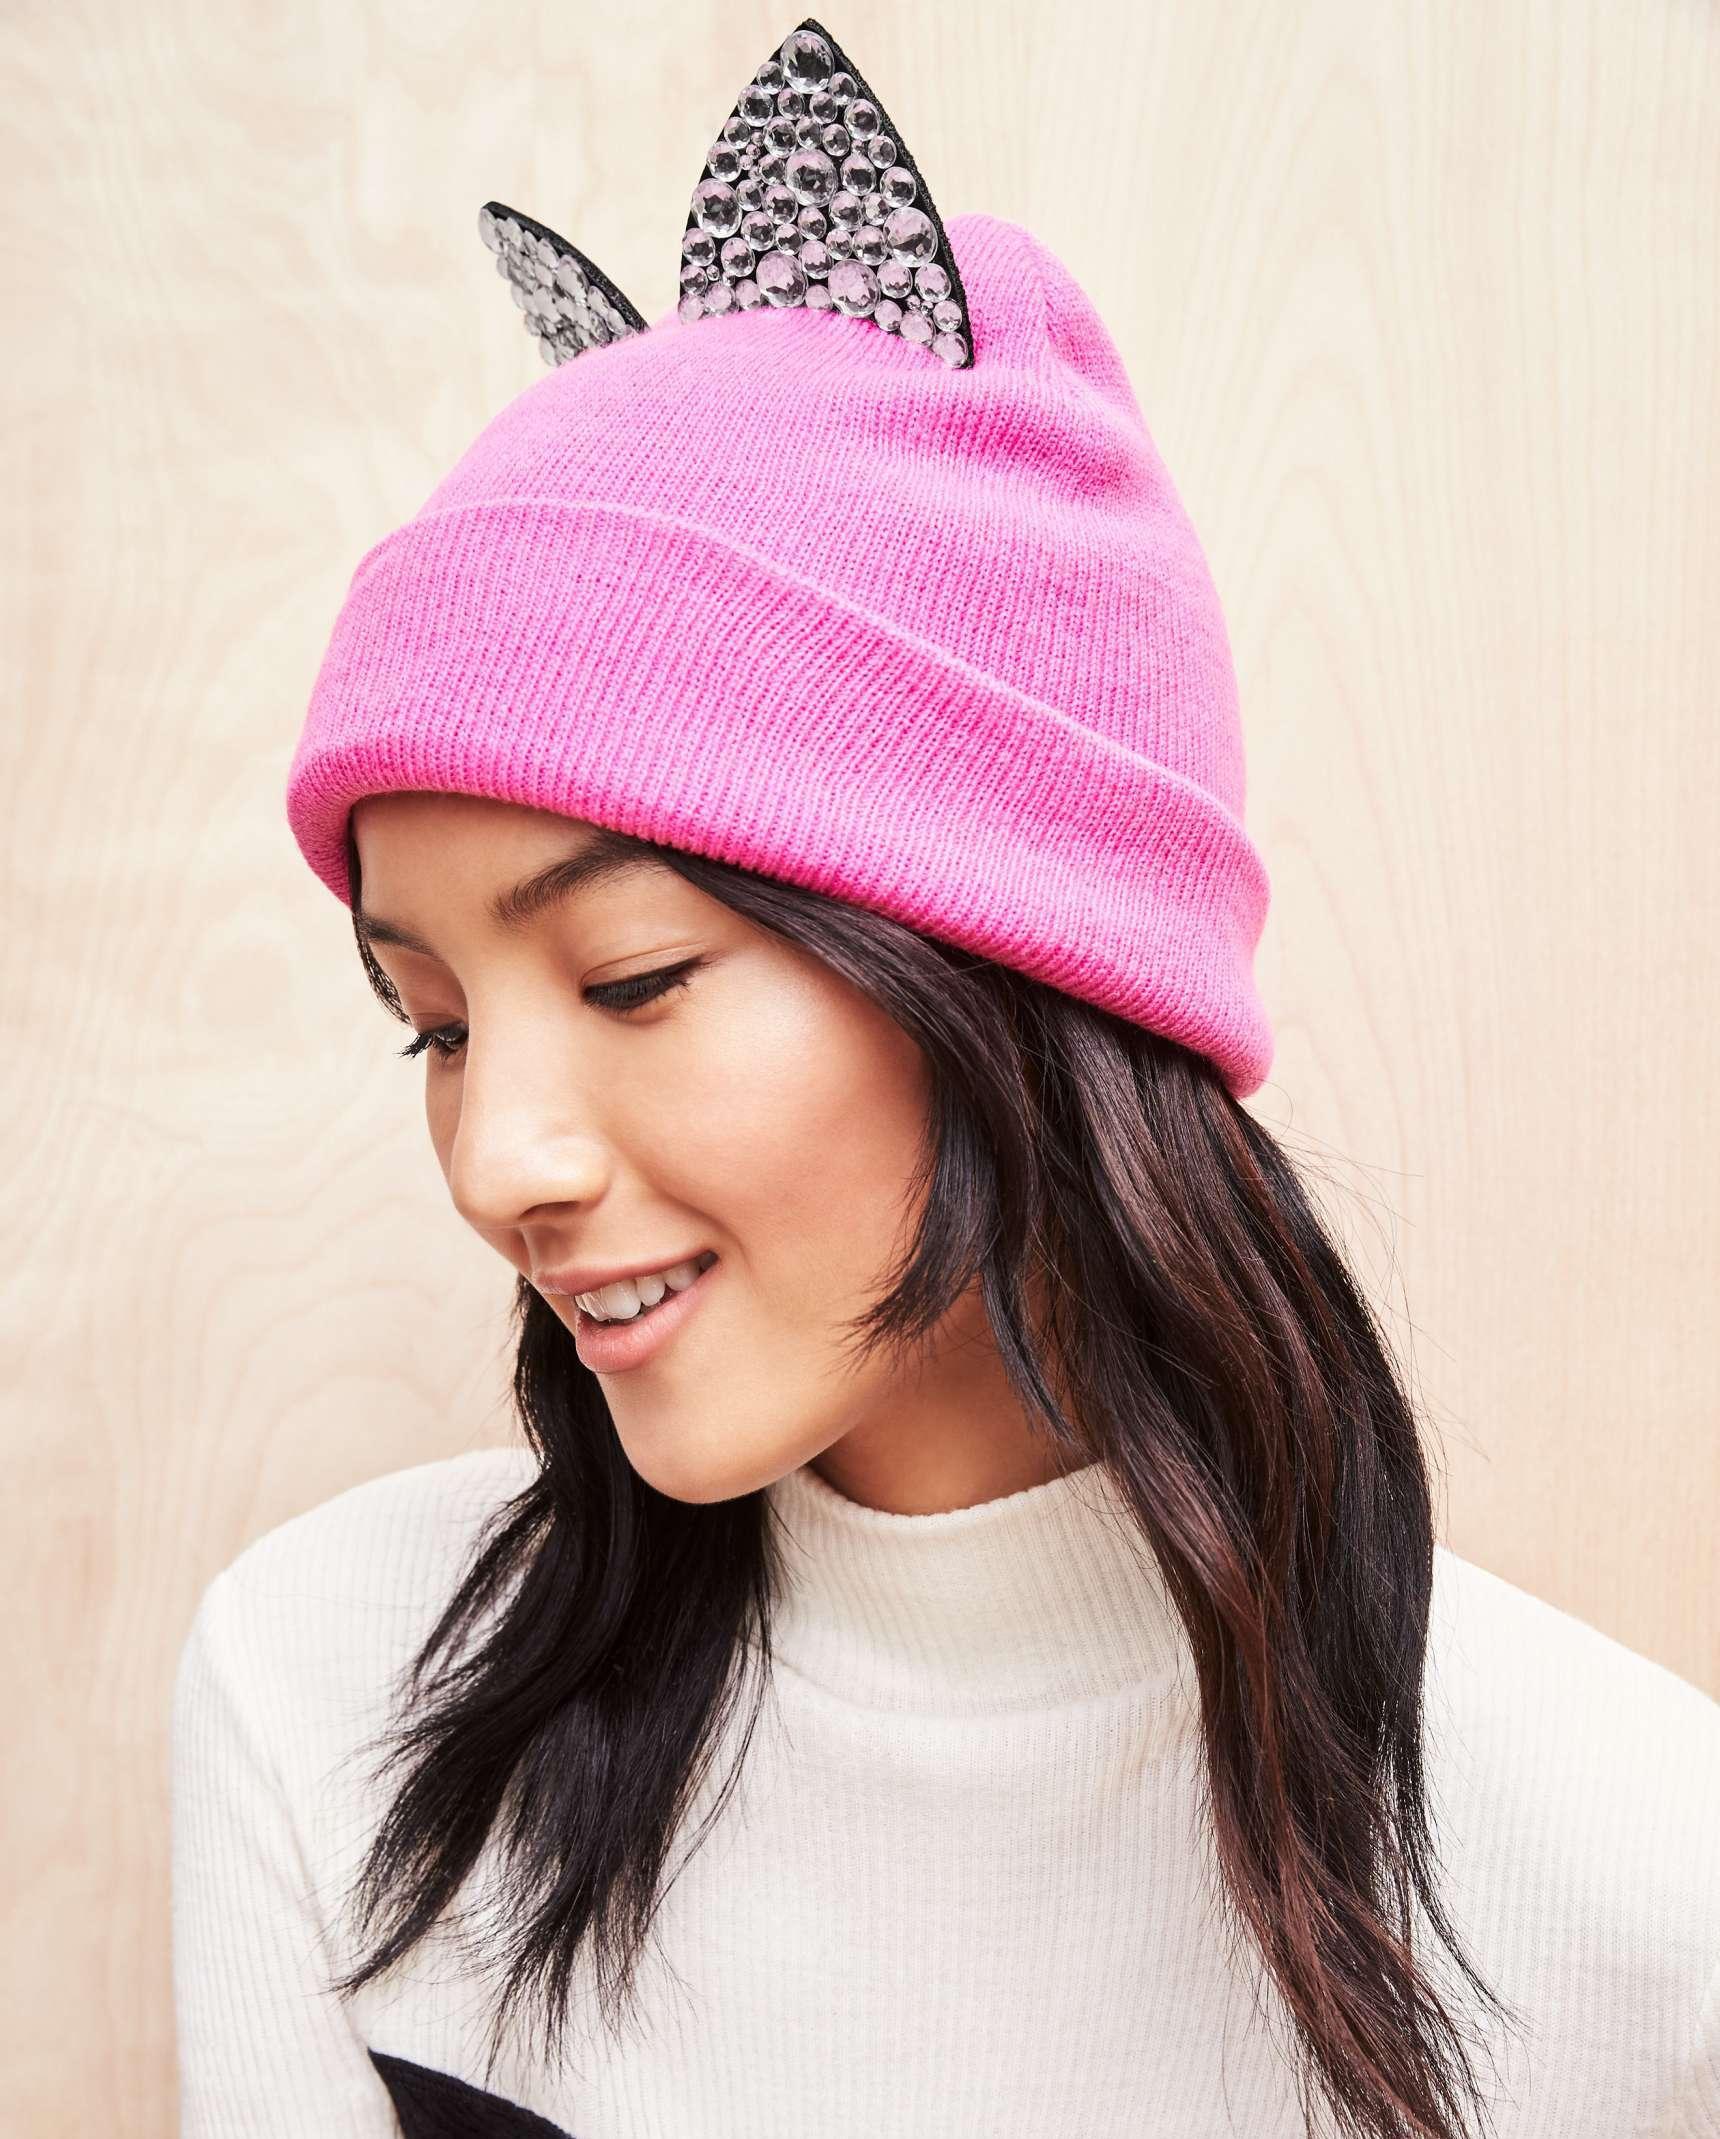 Jeweled cat-ear beanie : Glam gifts for a female BFF